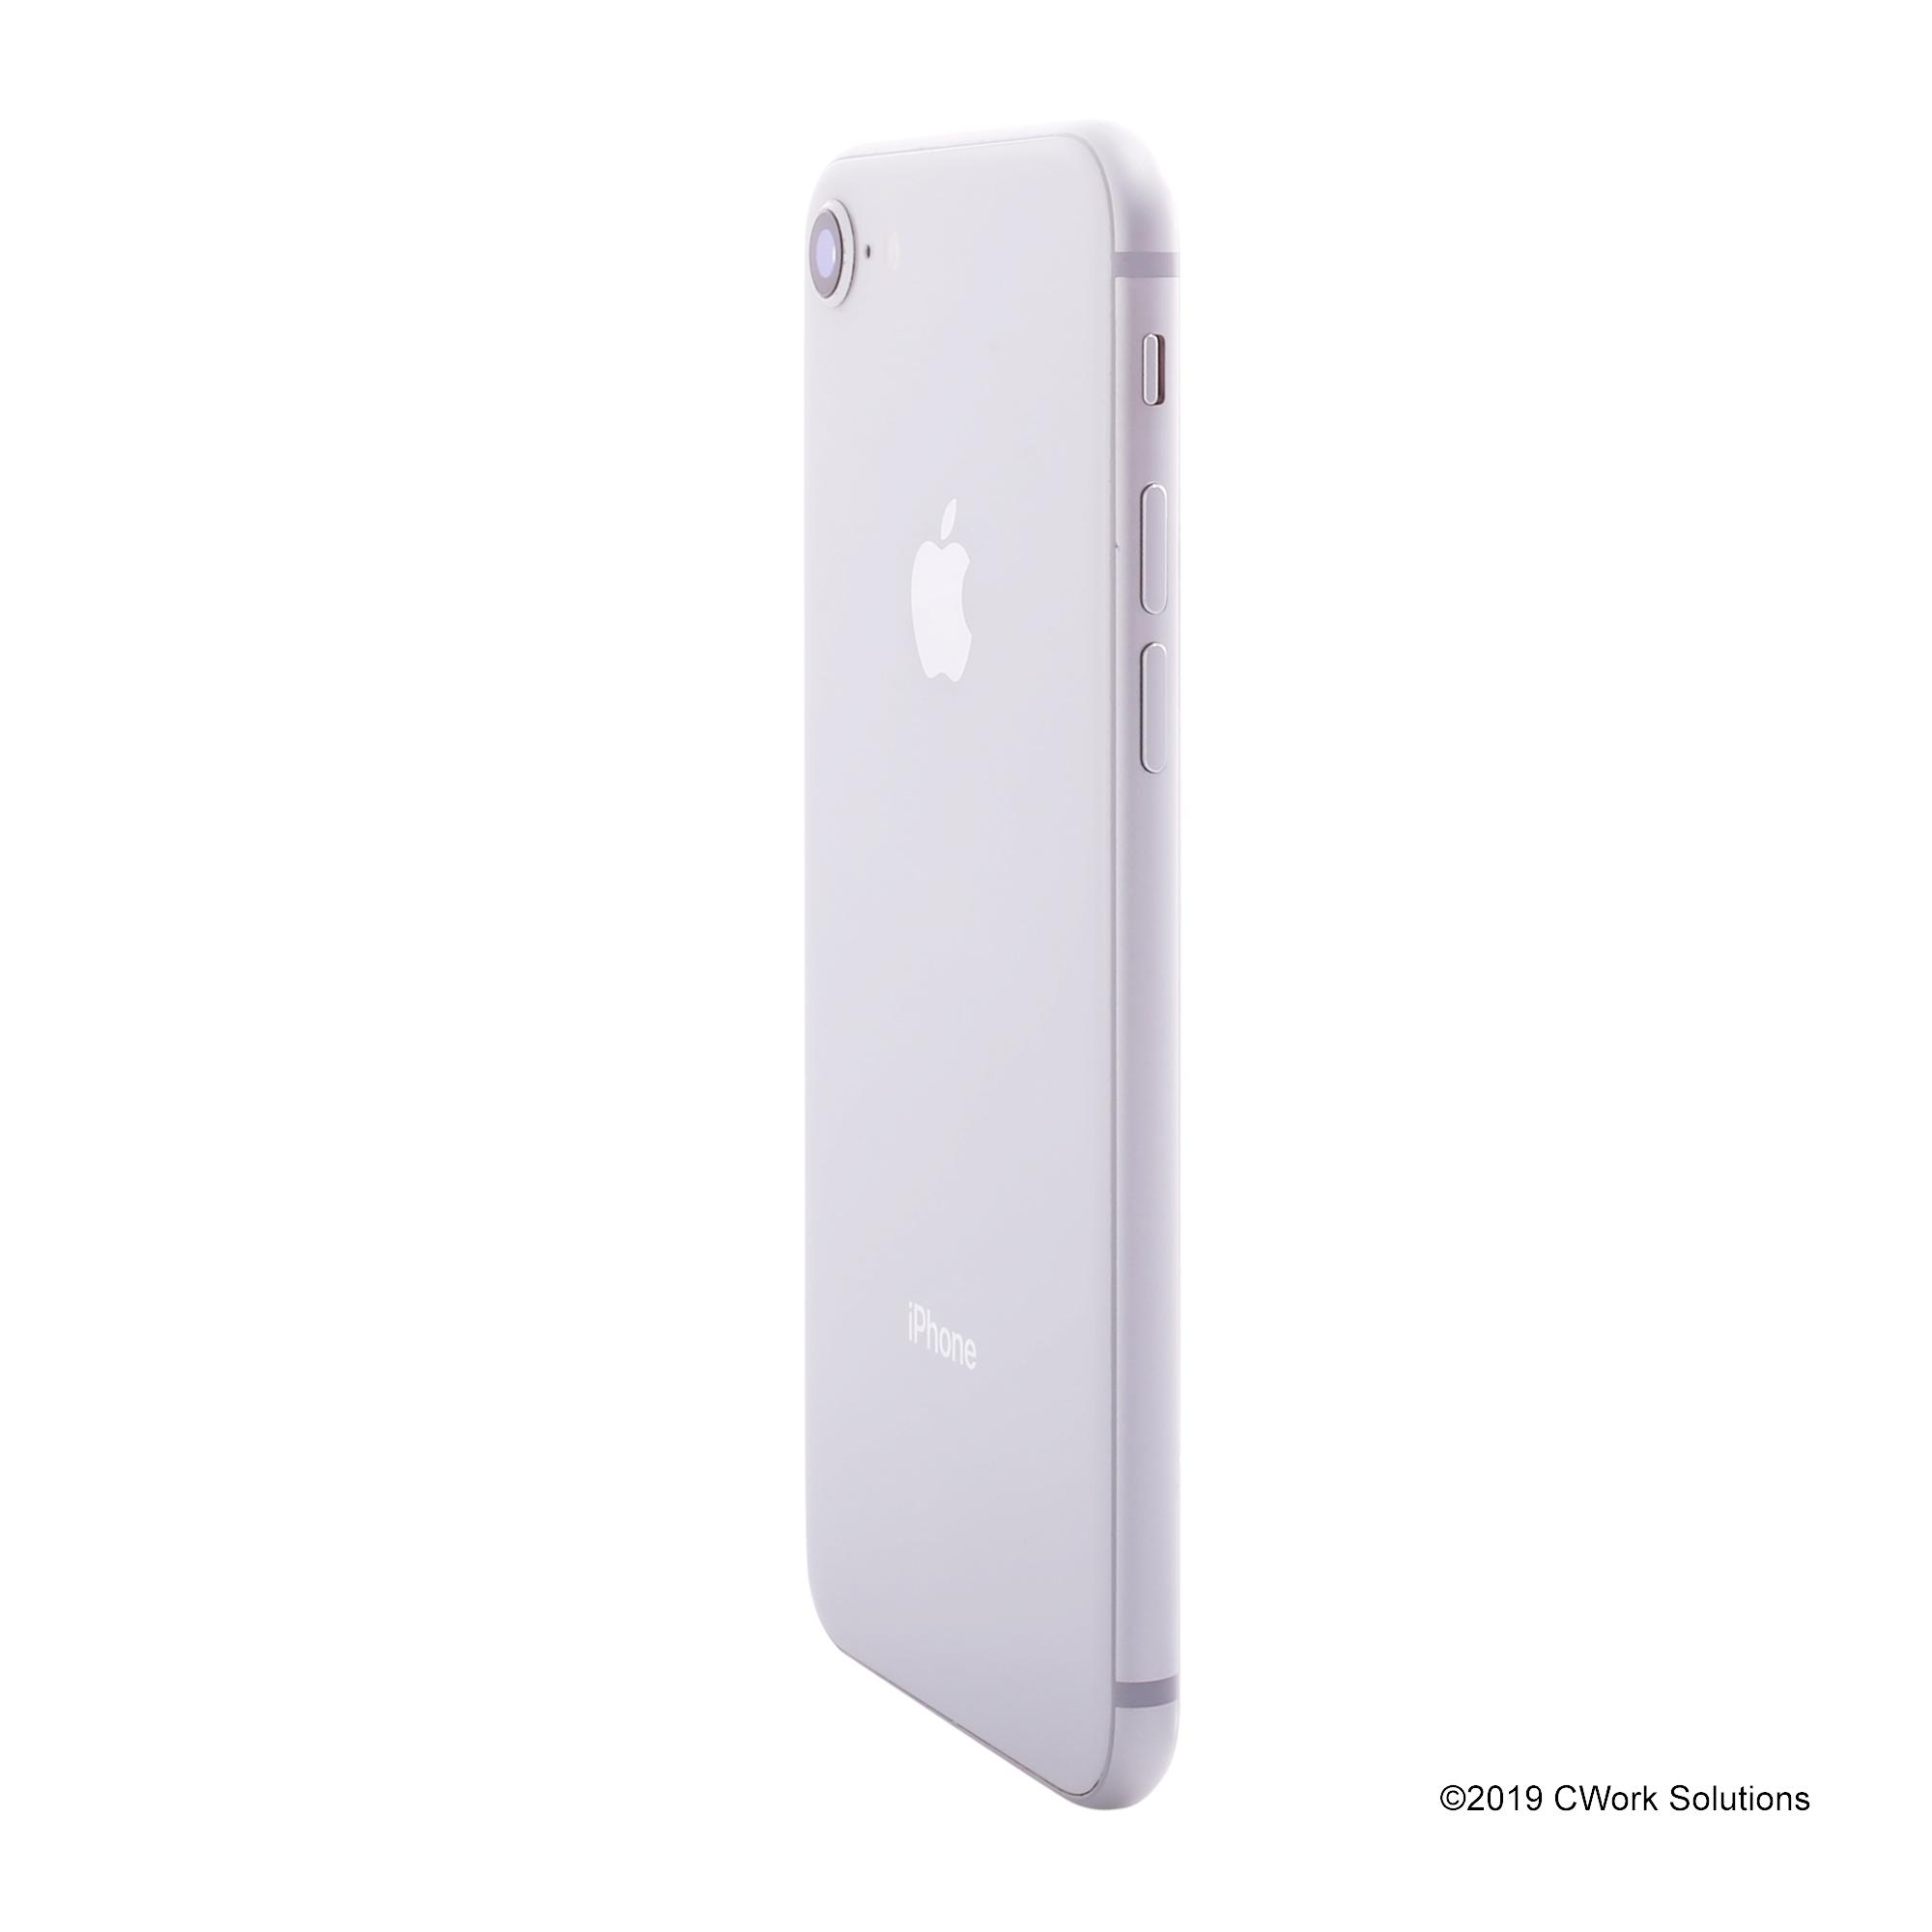 Apple-iPhone-8-a1863-64GB-Verizon-Unlocked-Excellent thumbnail 20